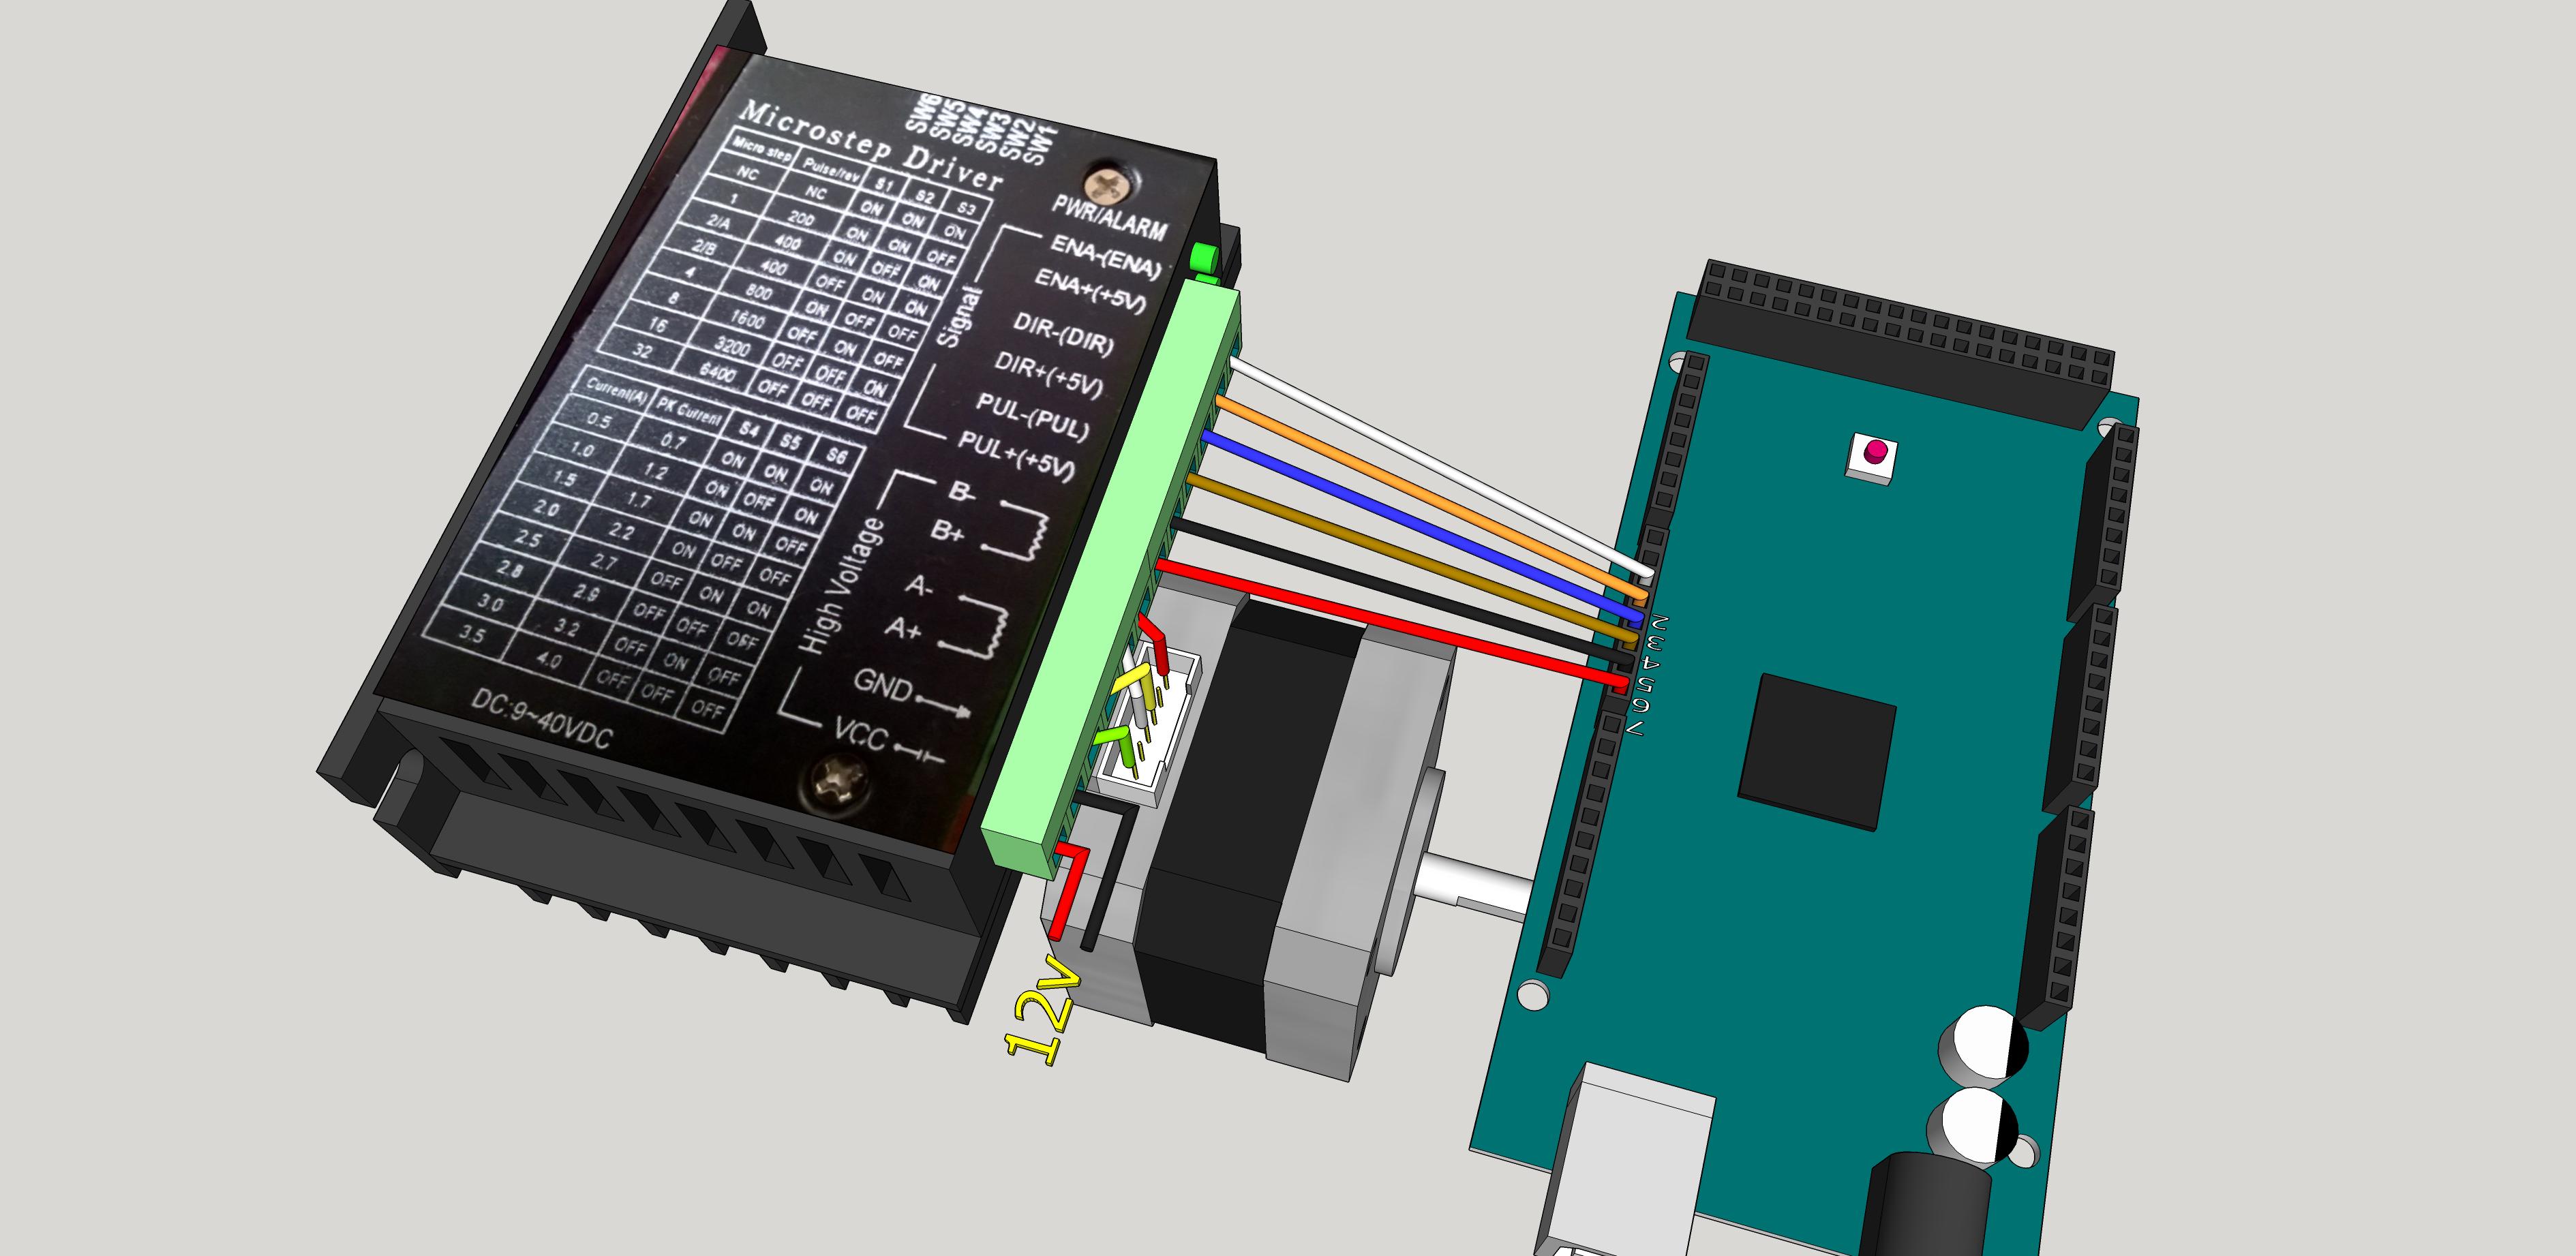 tb6600 stepper motor driver tester hackster io GMC Fuse Box Diagrams tb6600 stepper motor driver tester